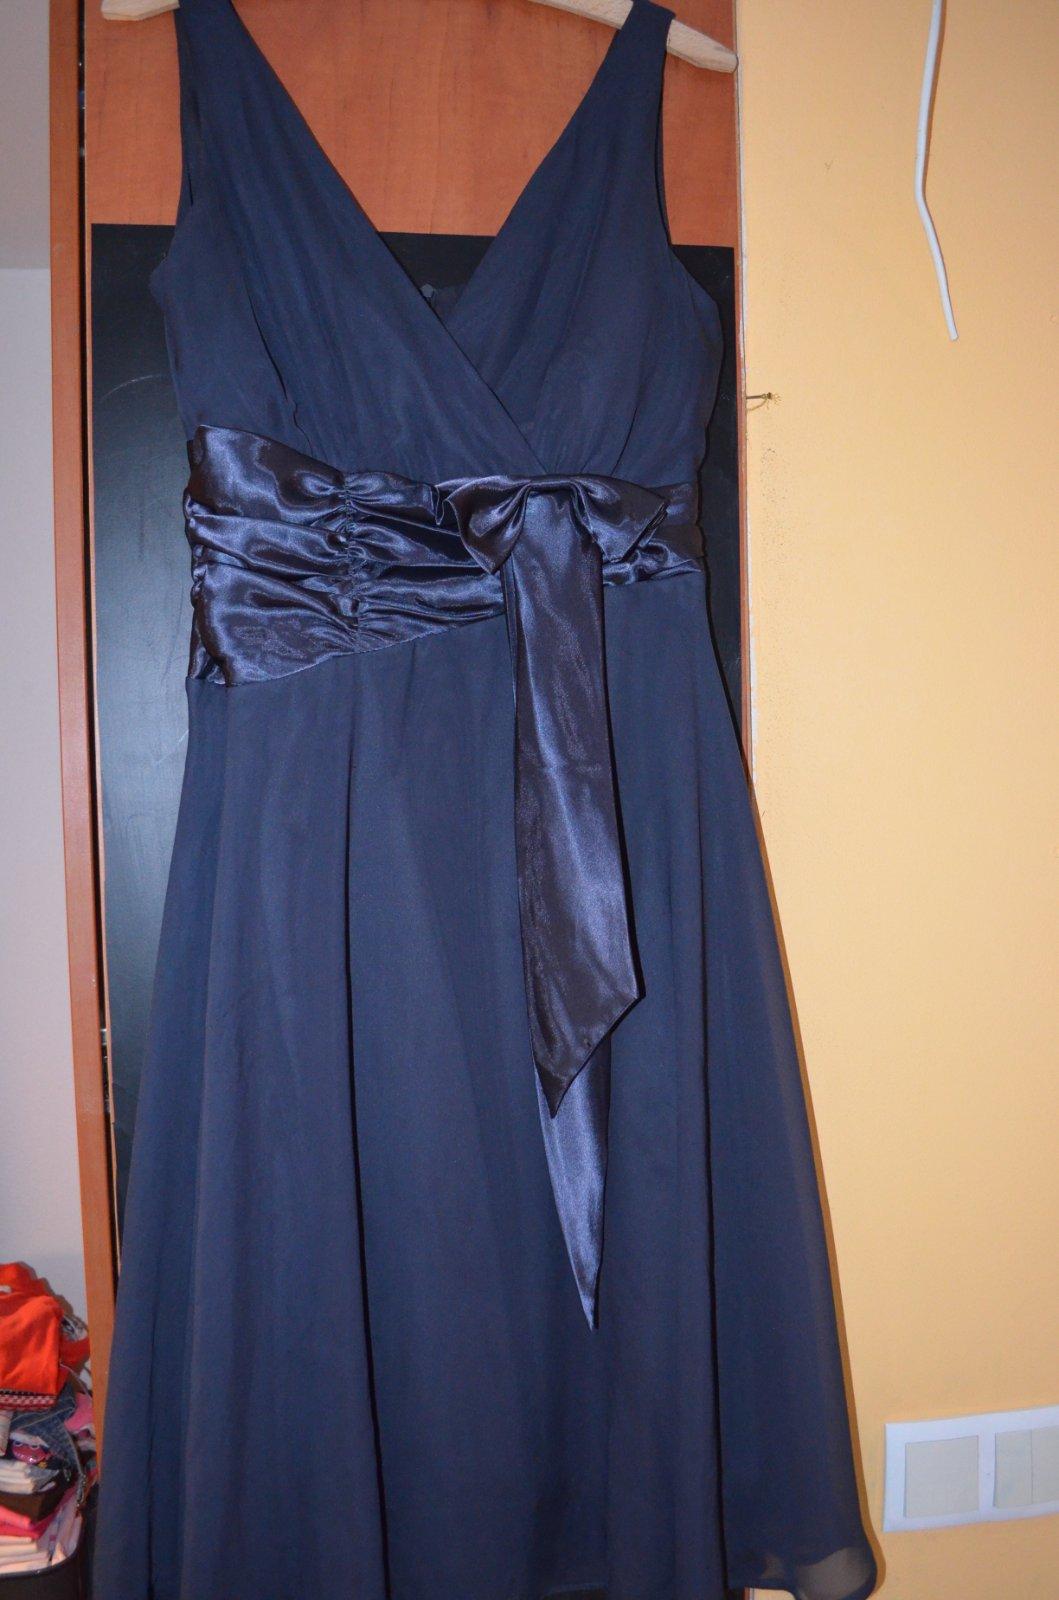 462cff0c4301 Spoločenské šaty v top stave